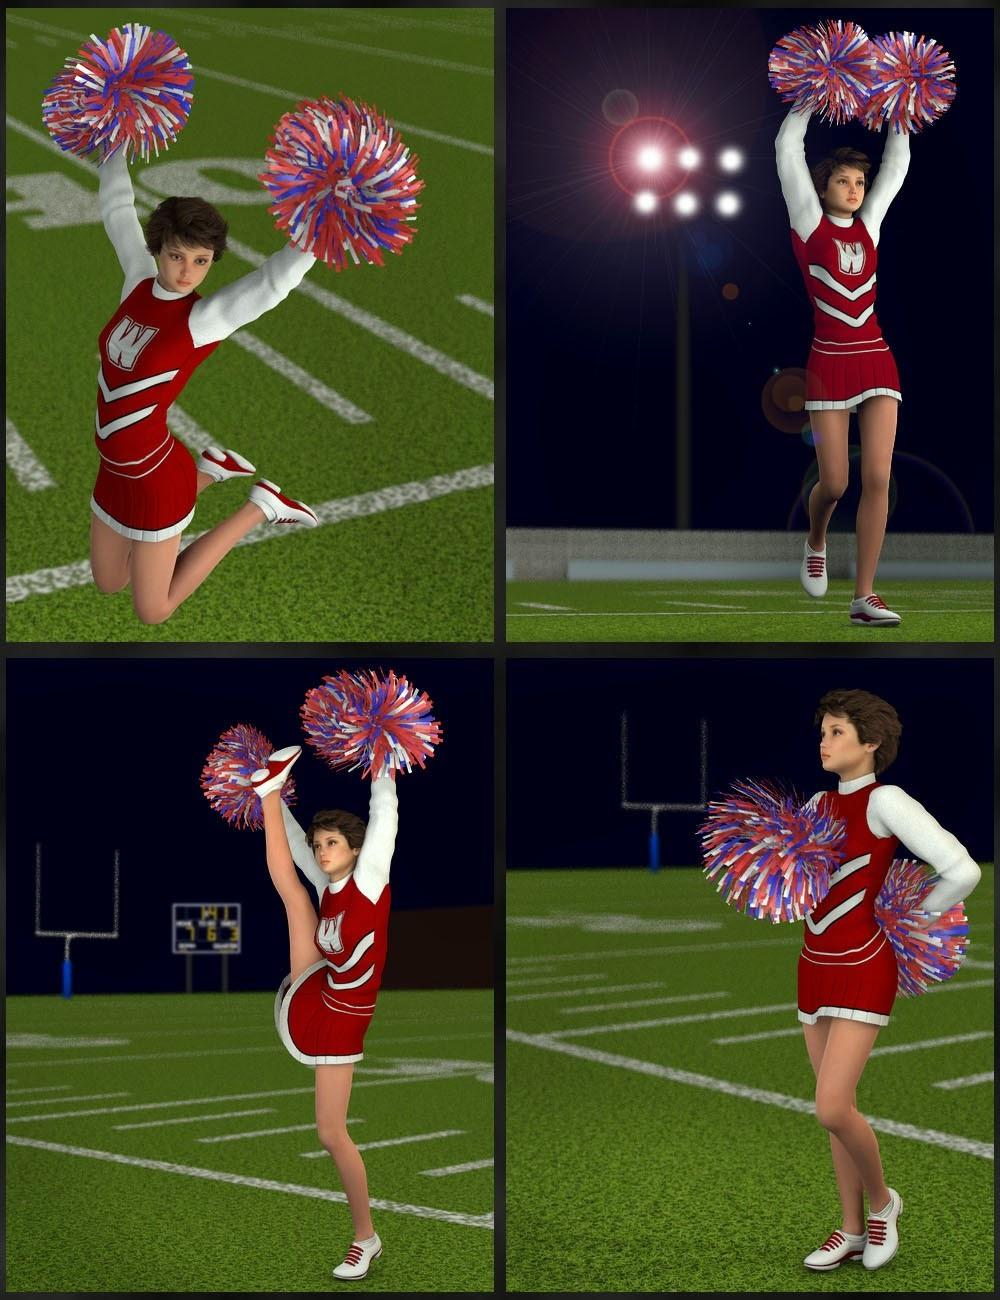 Cheerleader Pom Pom Poses